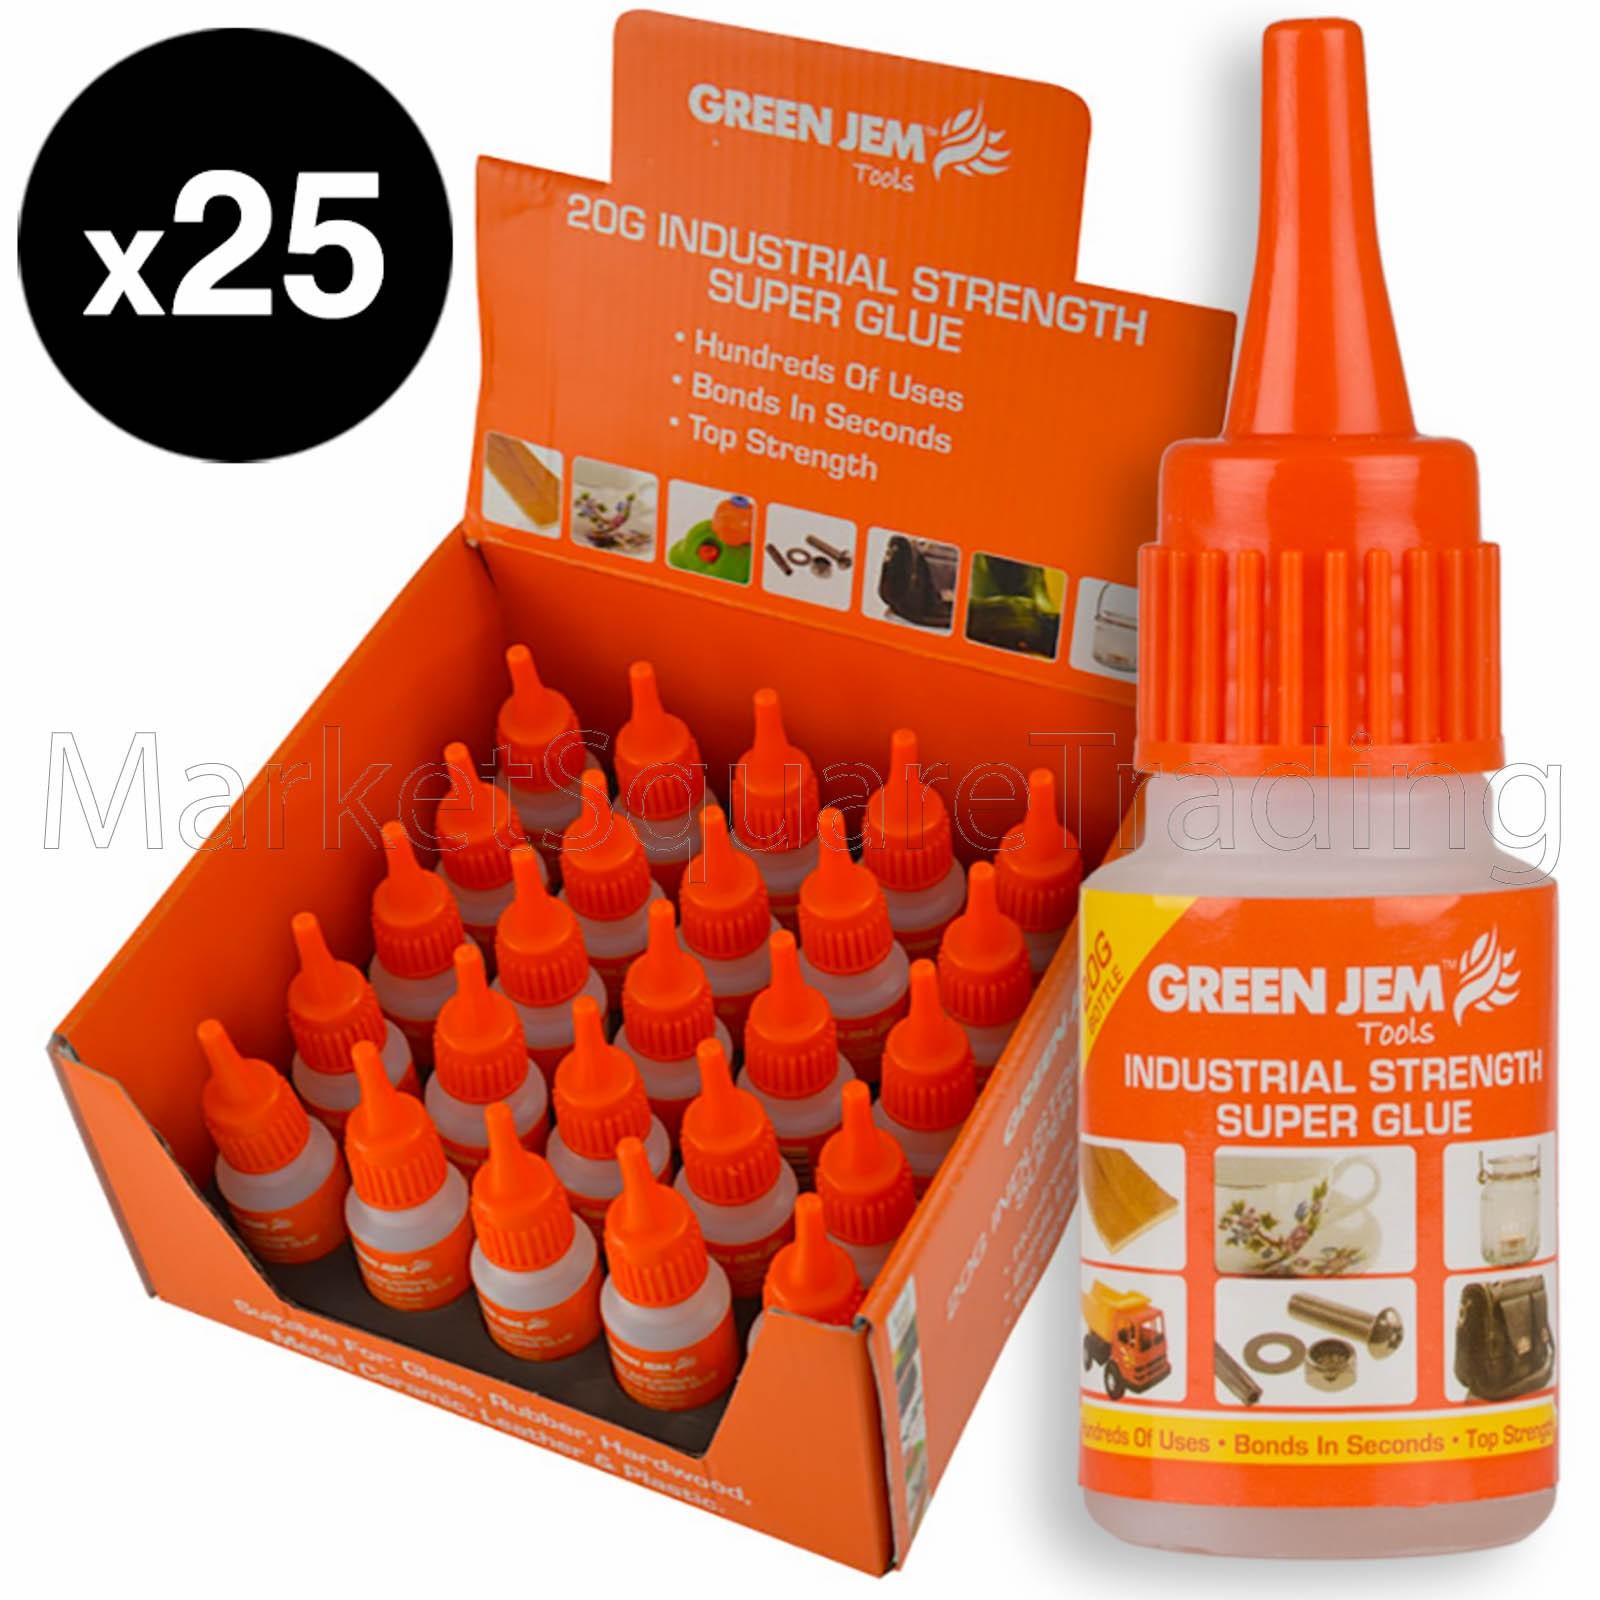 Super Glue High Strength Green Jem Strong 25x20g Bottles Cyanoacrylate TGGL20G